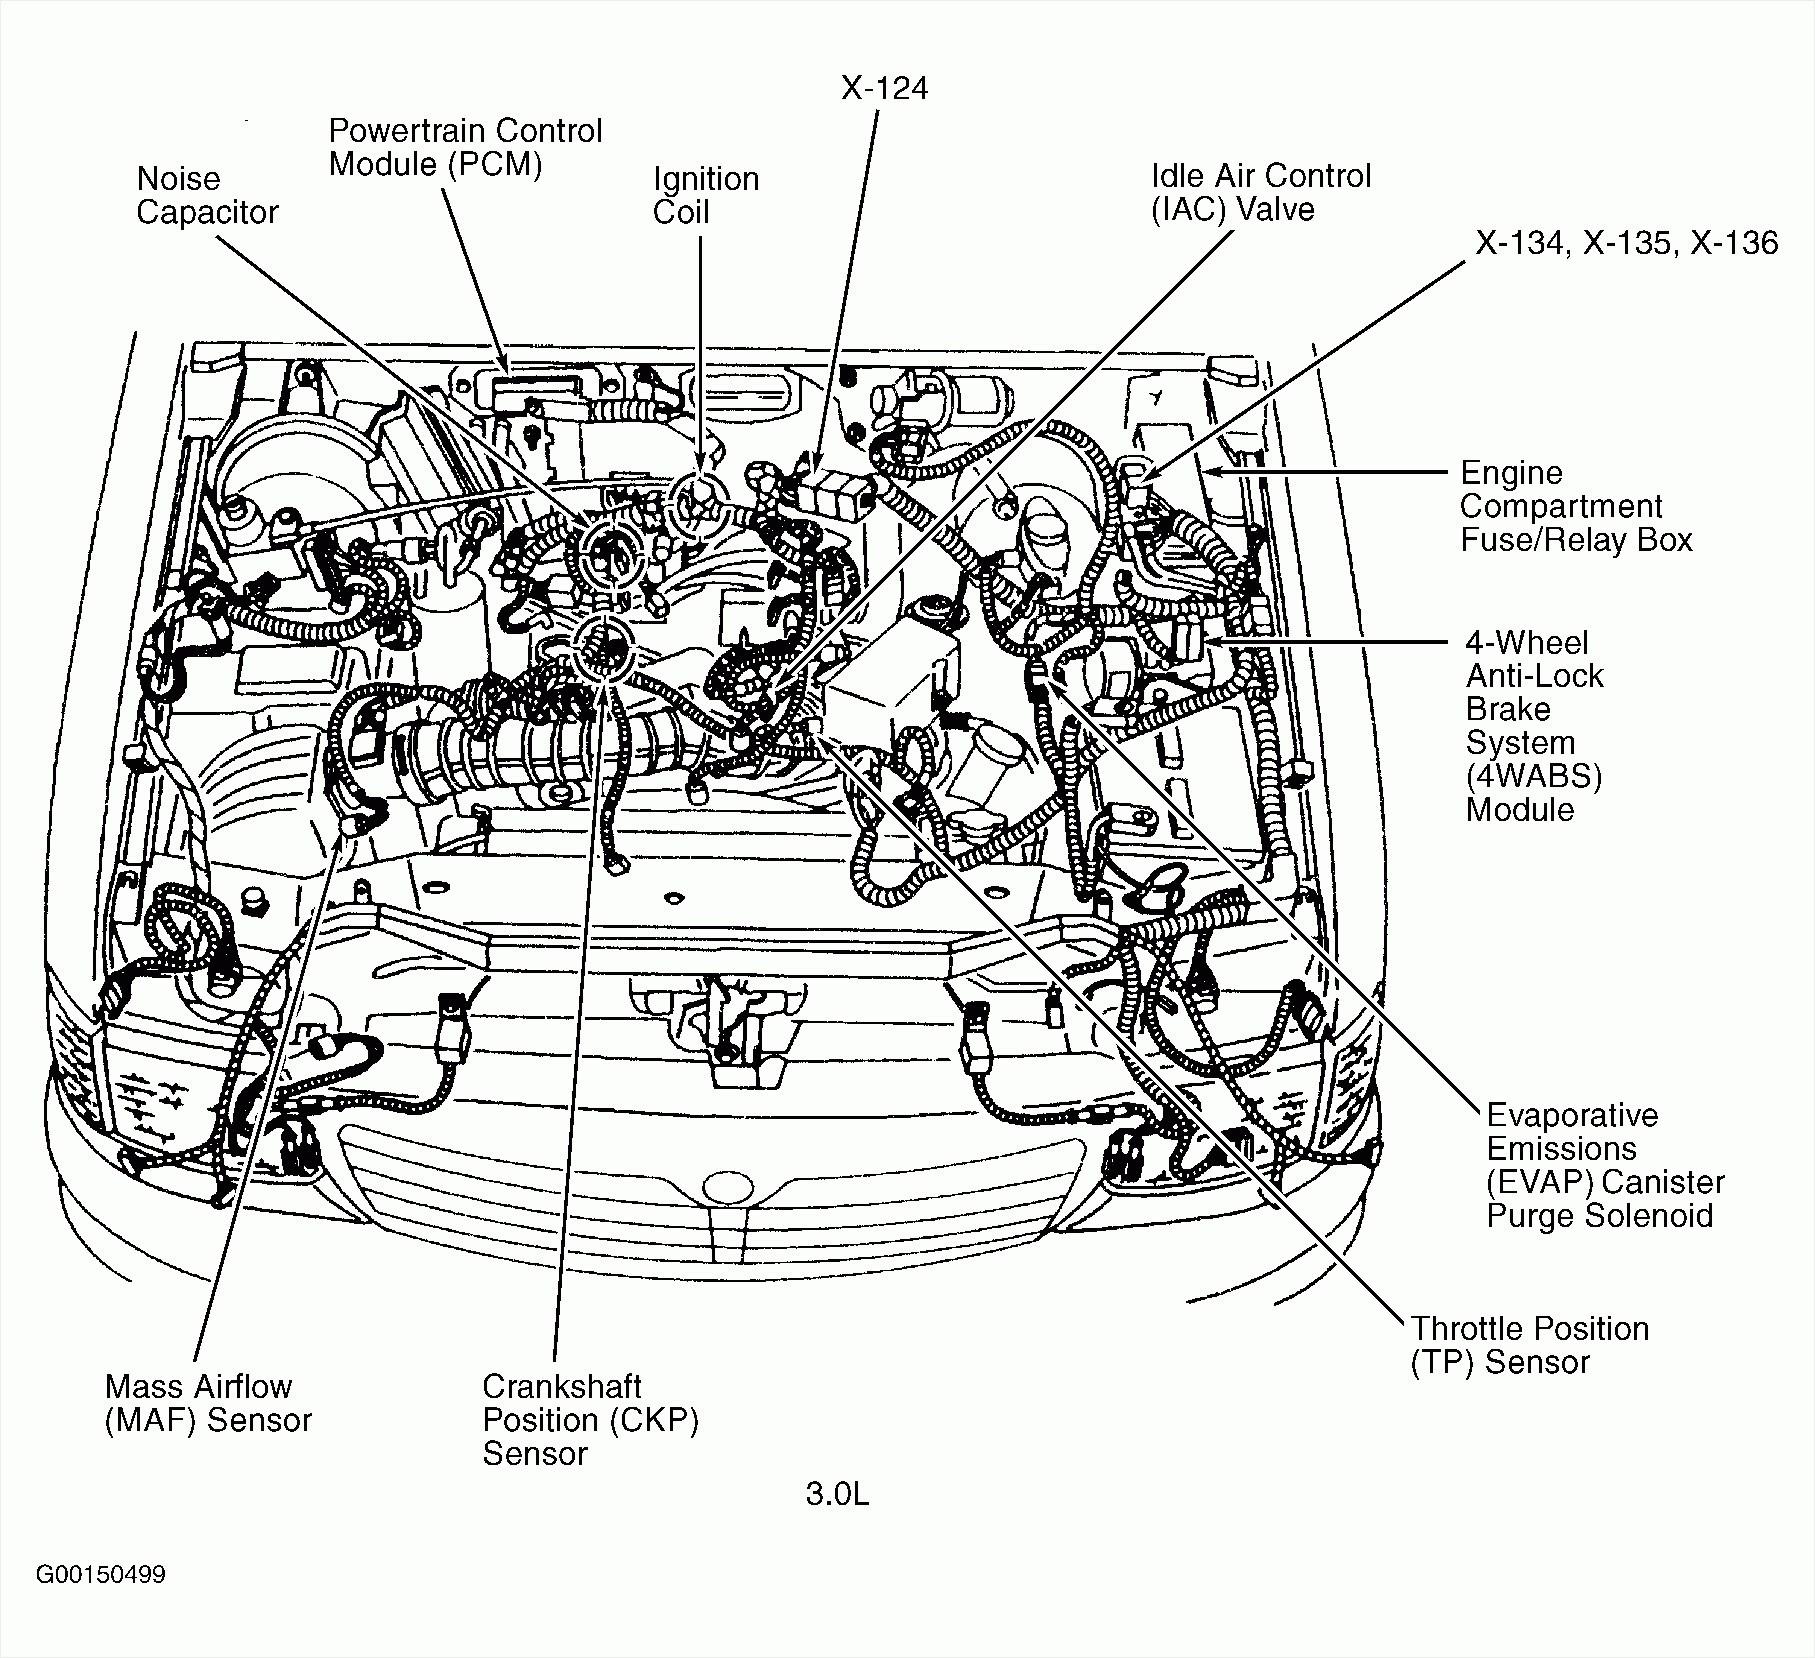 2010 Lacrosse Engine Diagram Wiring Diagram Heat Warehouse B Heat Warehouse B Pmov2019 It